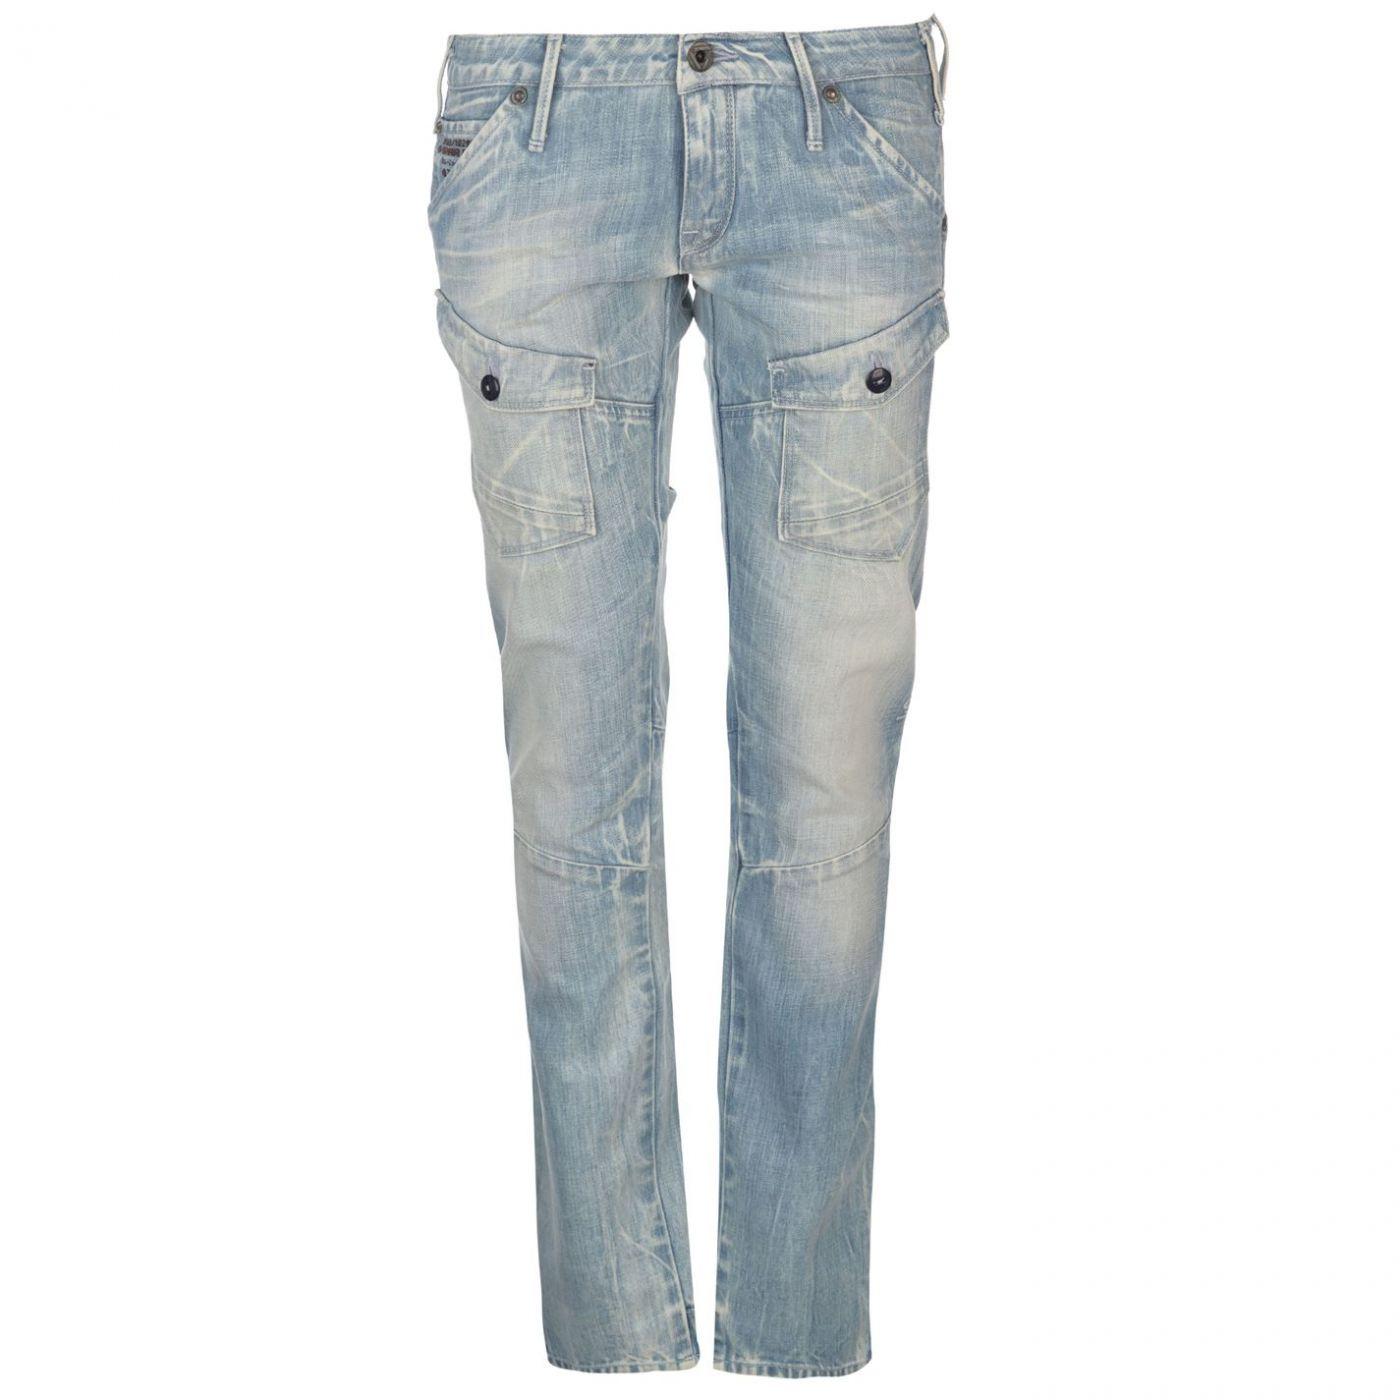 G Star 60212 Jeans